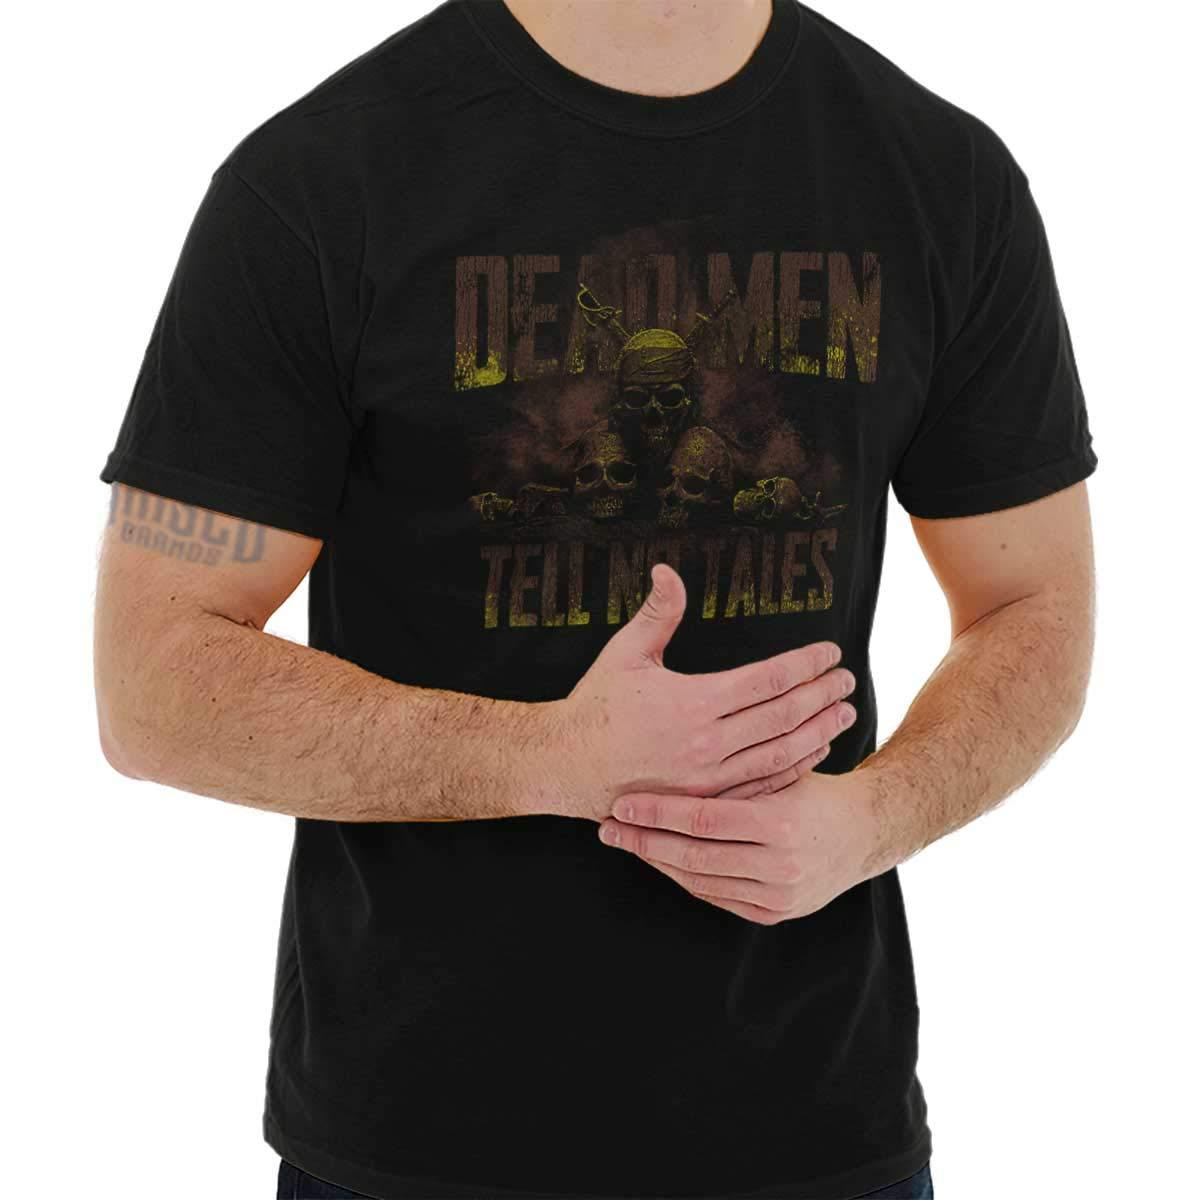 Pirate Ship Skull Edgy Movie Captain T Shirt Tee 3839